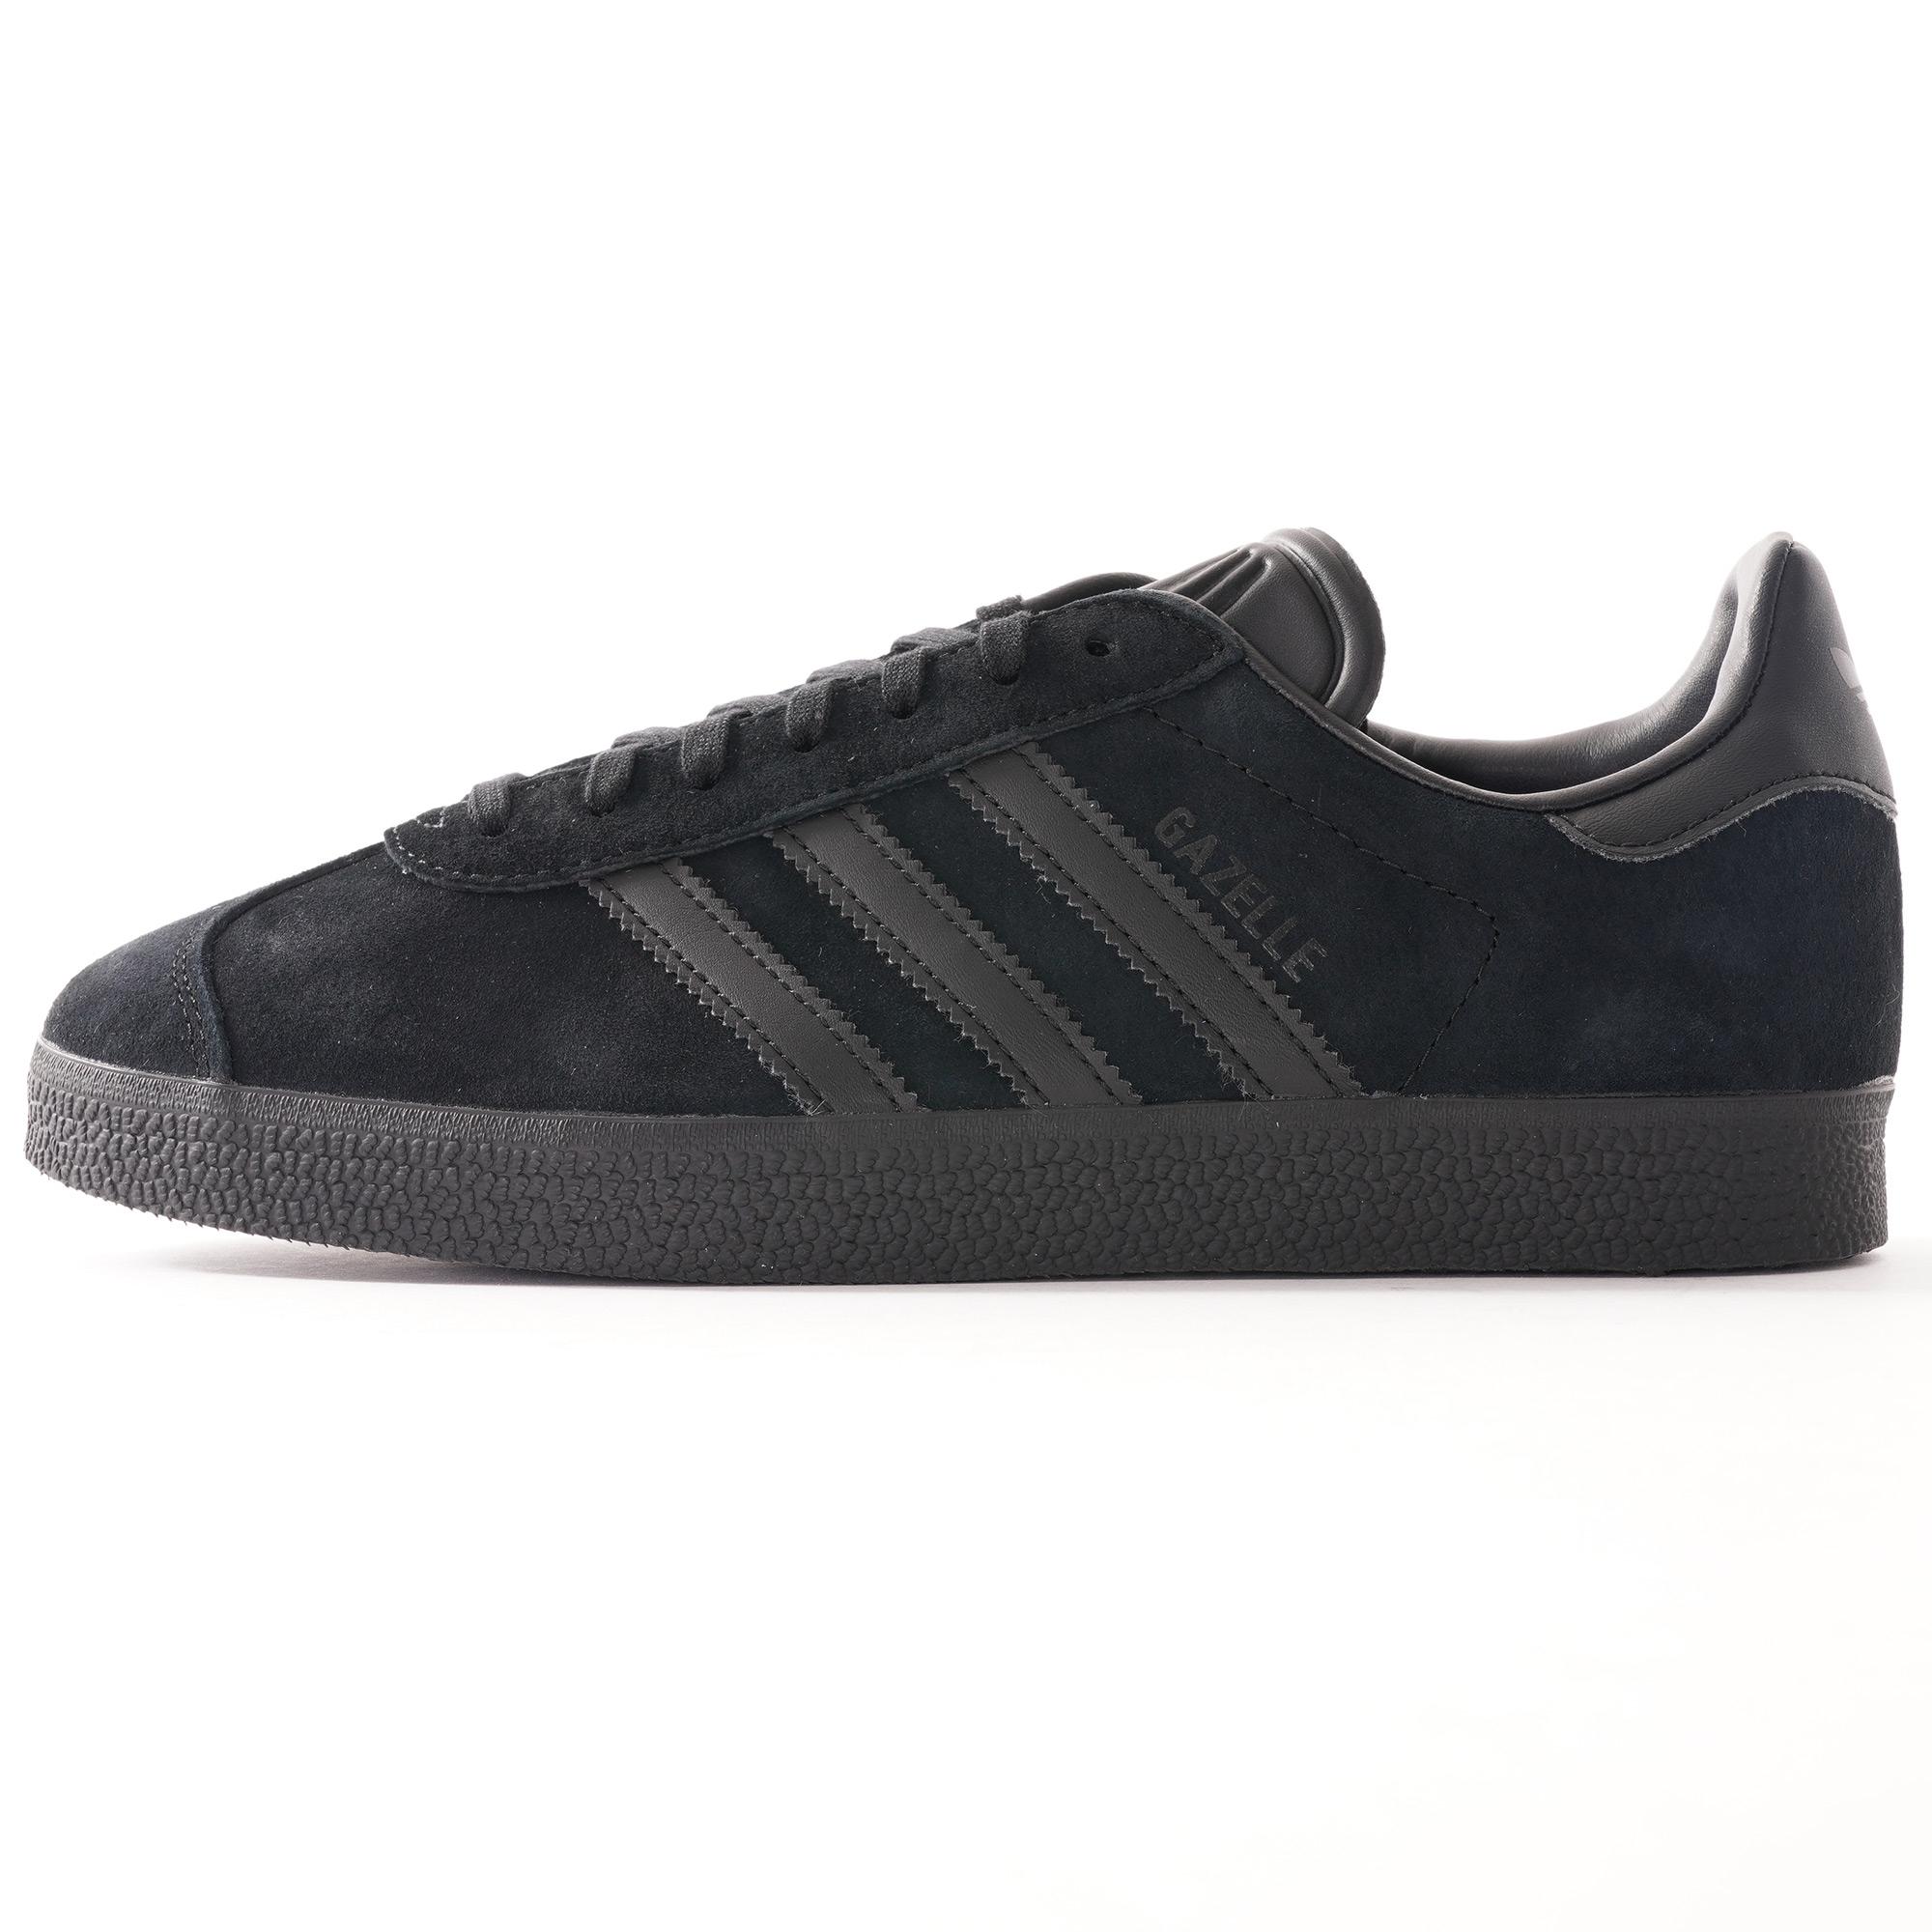 Adidas Originals Gazelle - Core Black